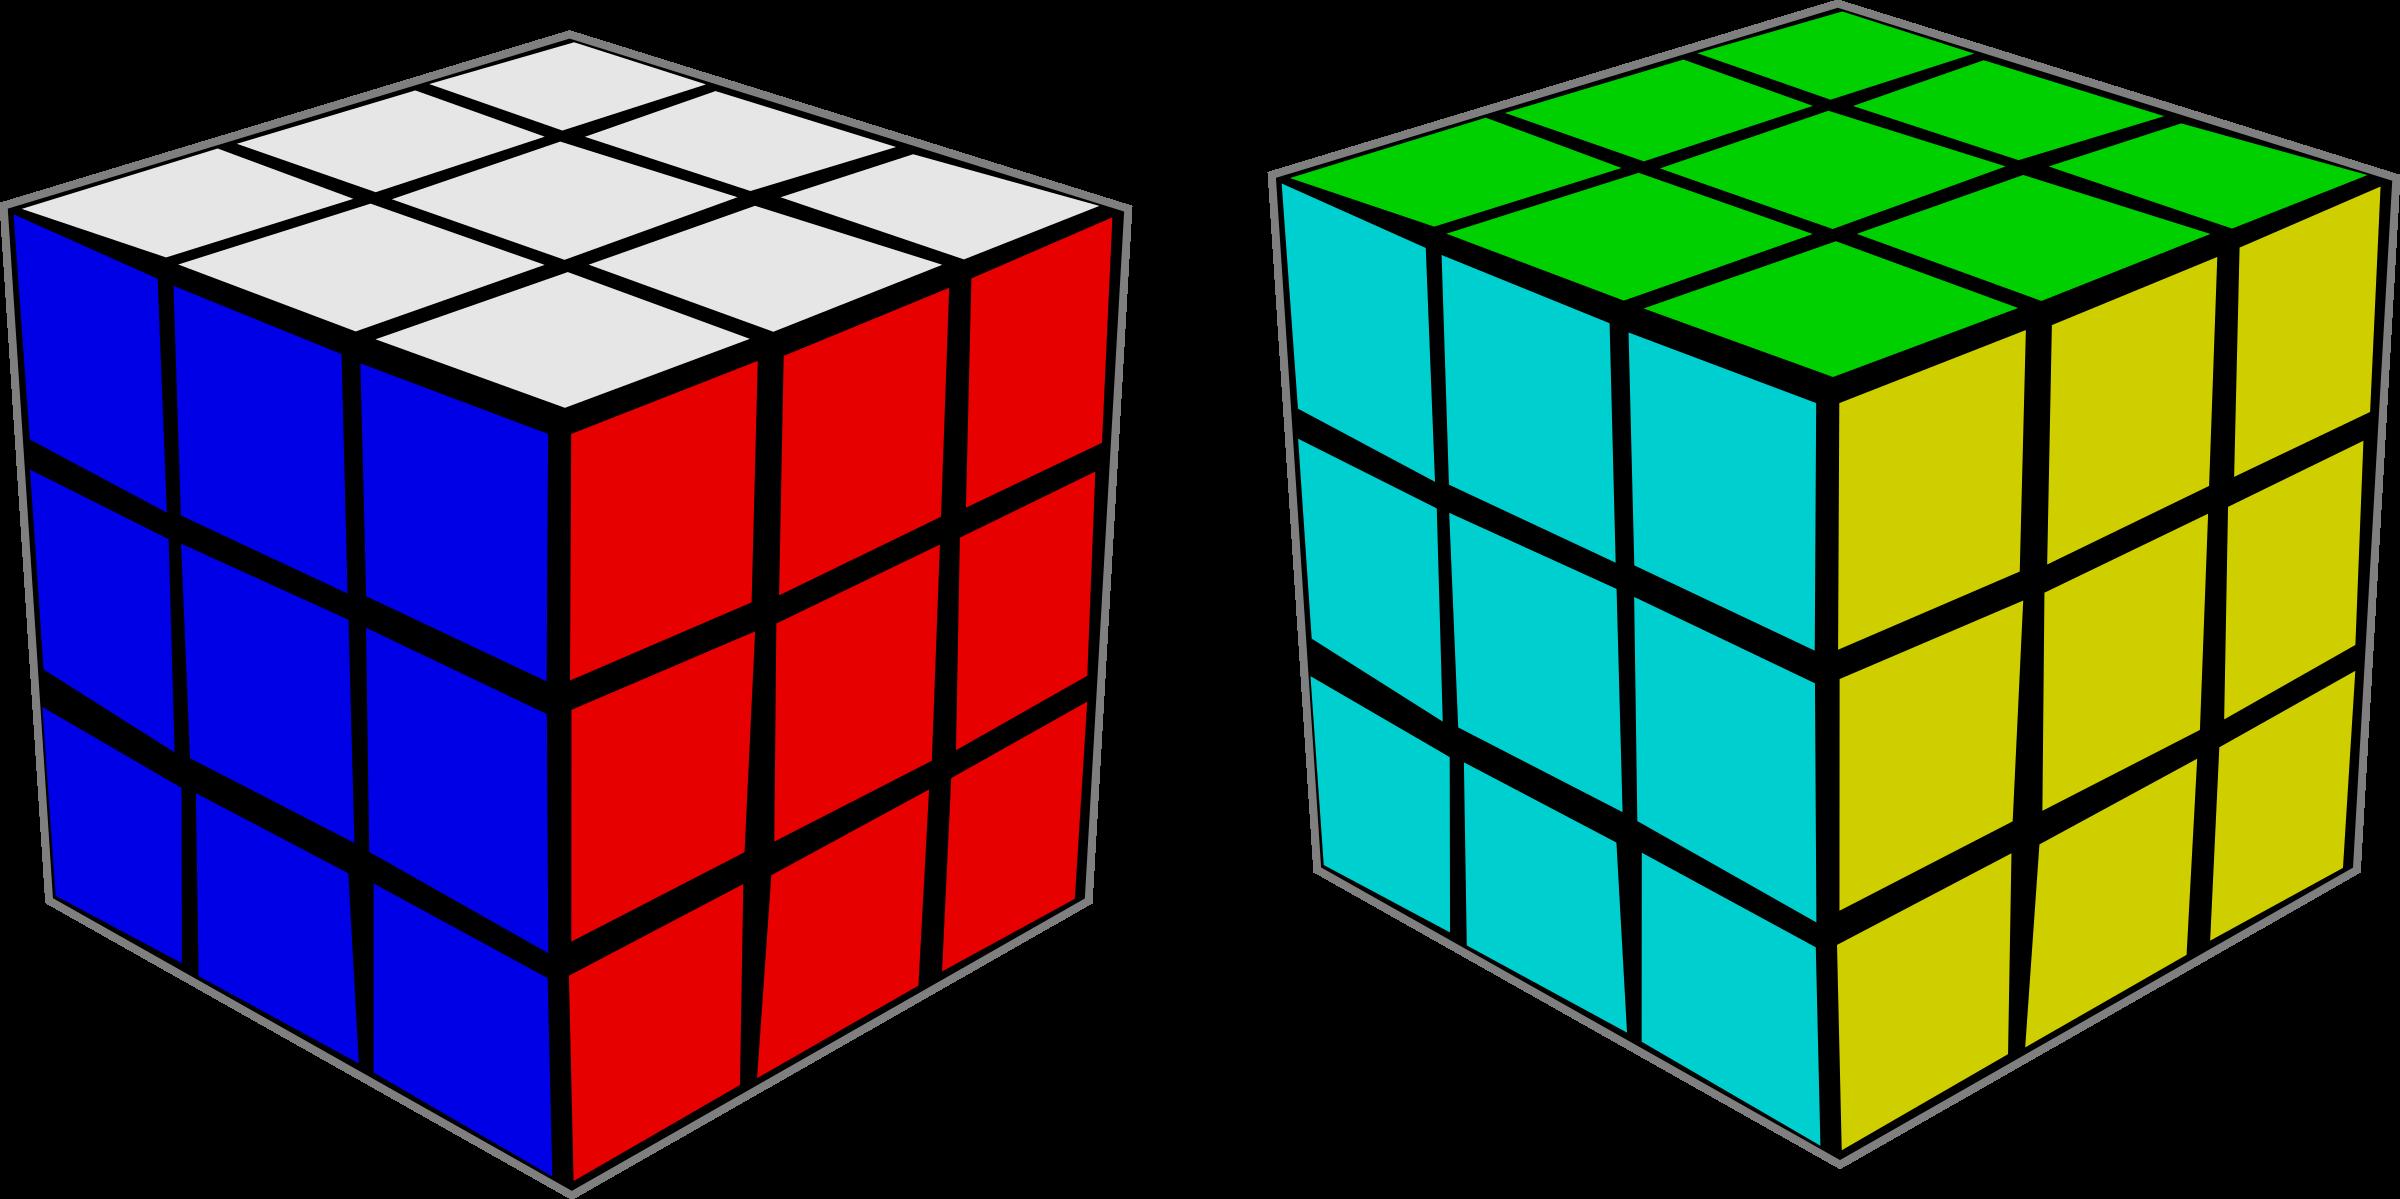 Cube clipart svg. Rubik s rubiks